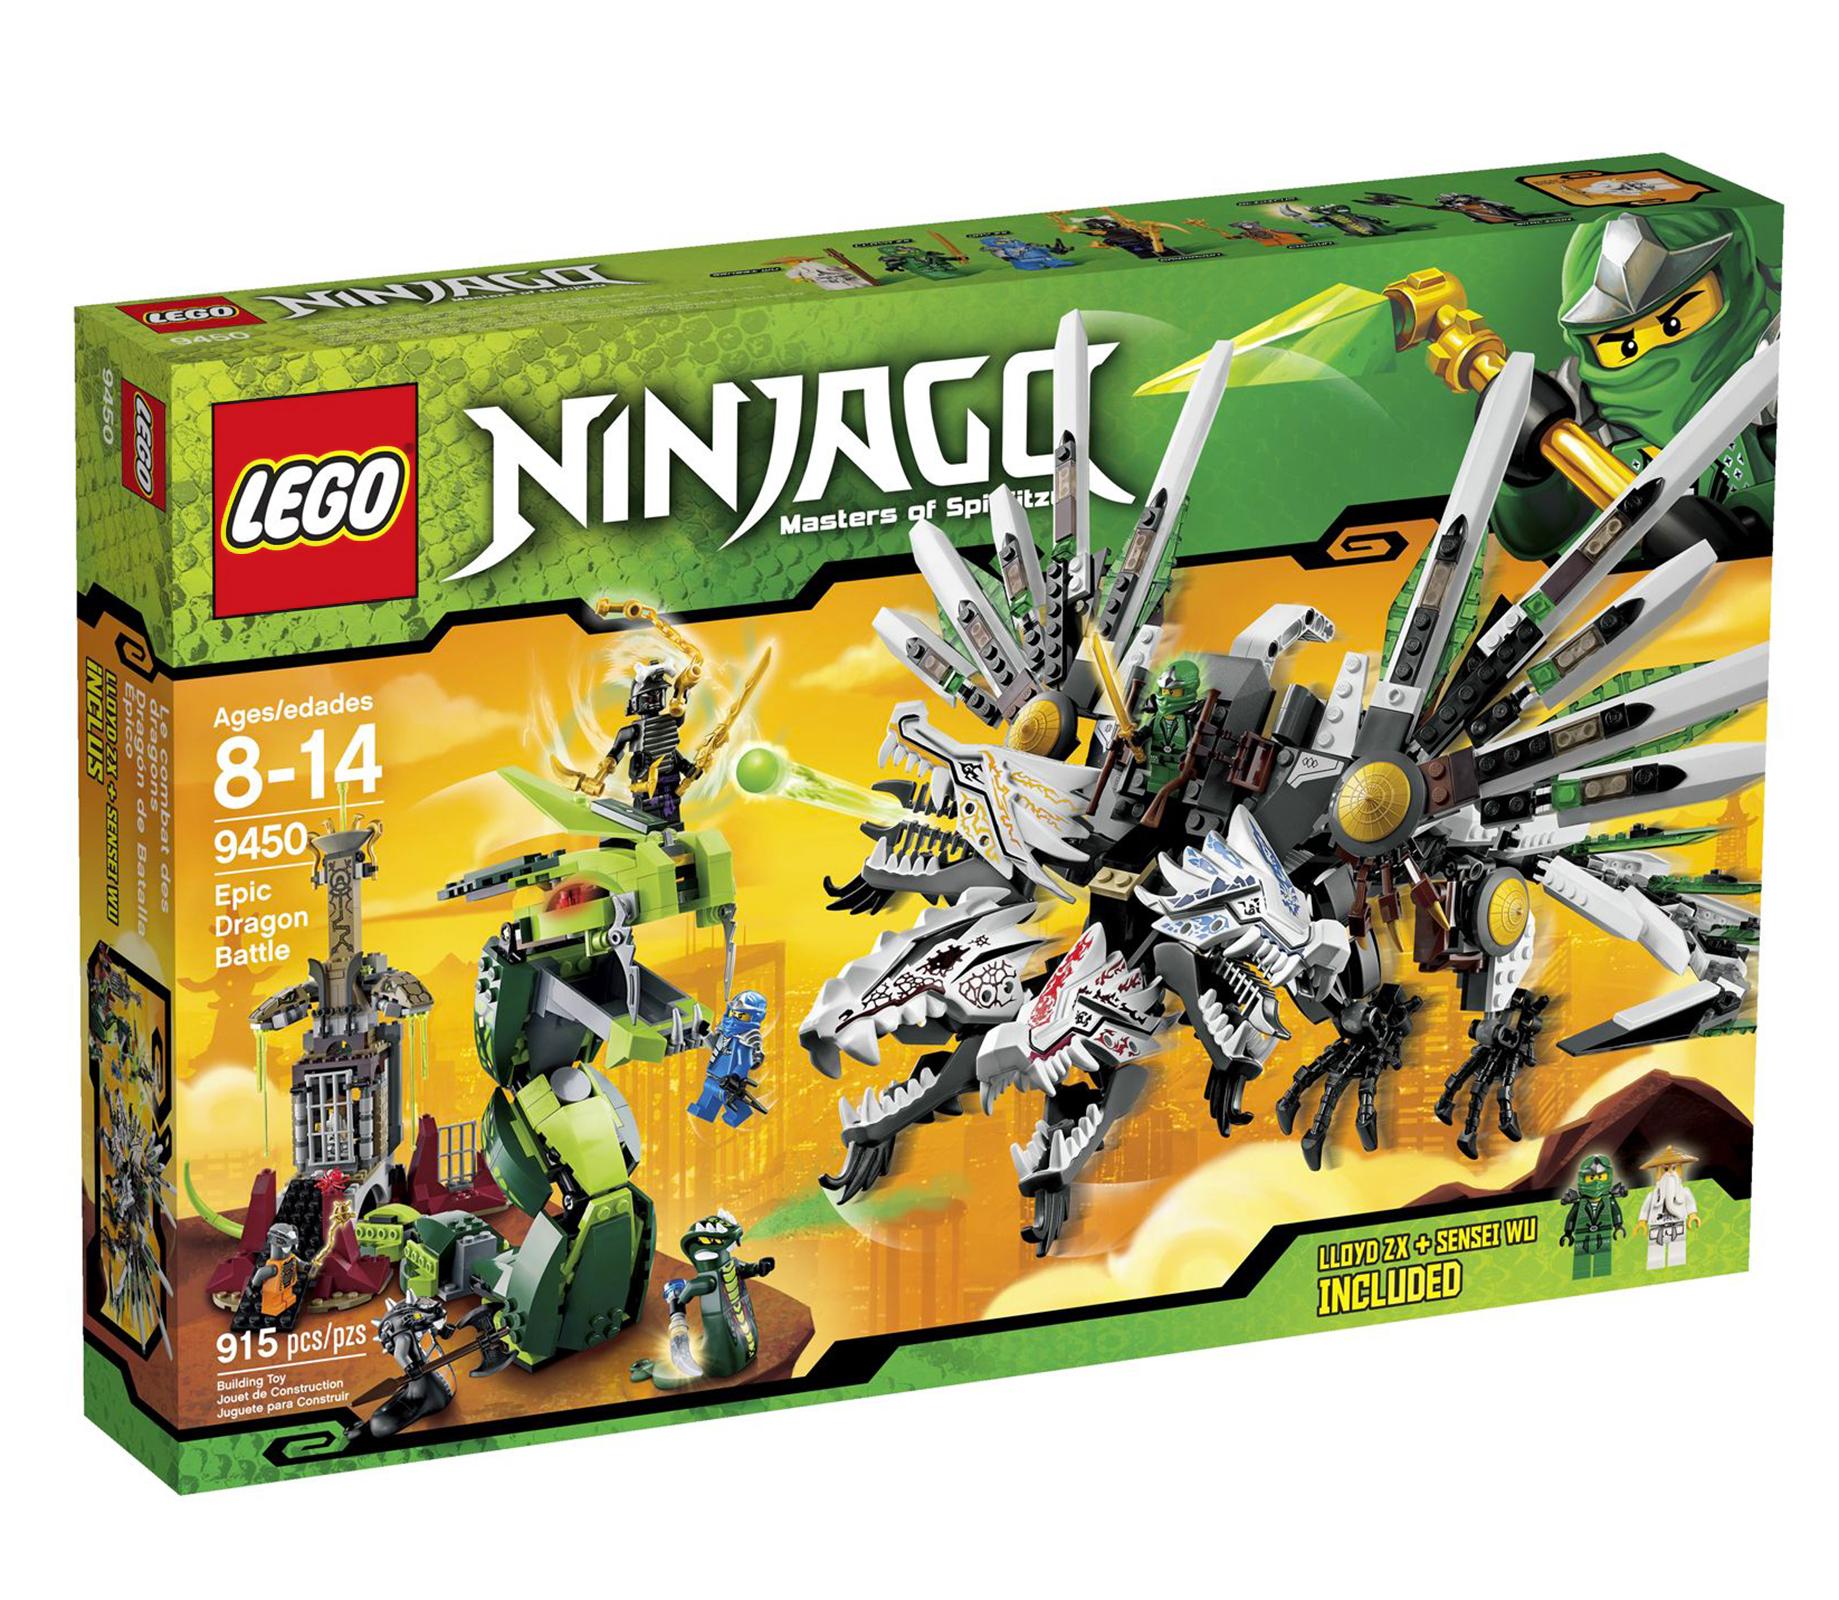 Ninja Drago Lego Set: Encourage Imaginative Play for Boys with Kmart